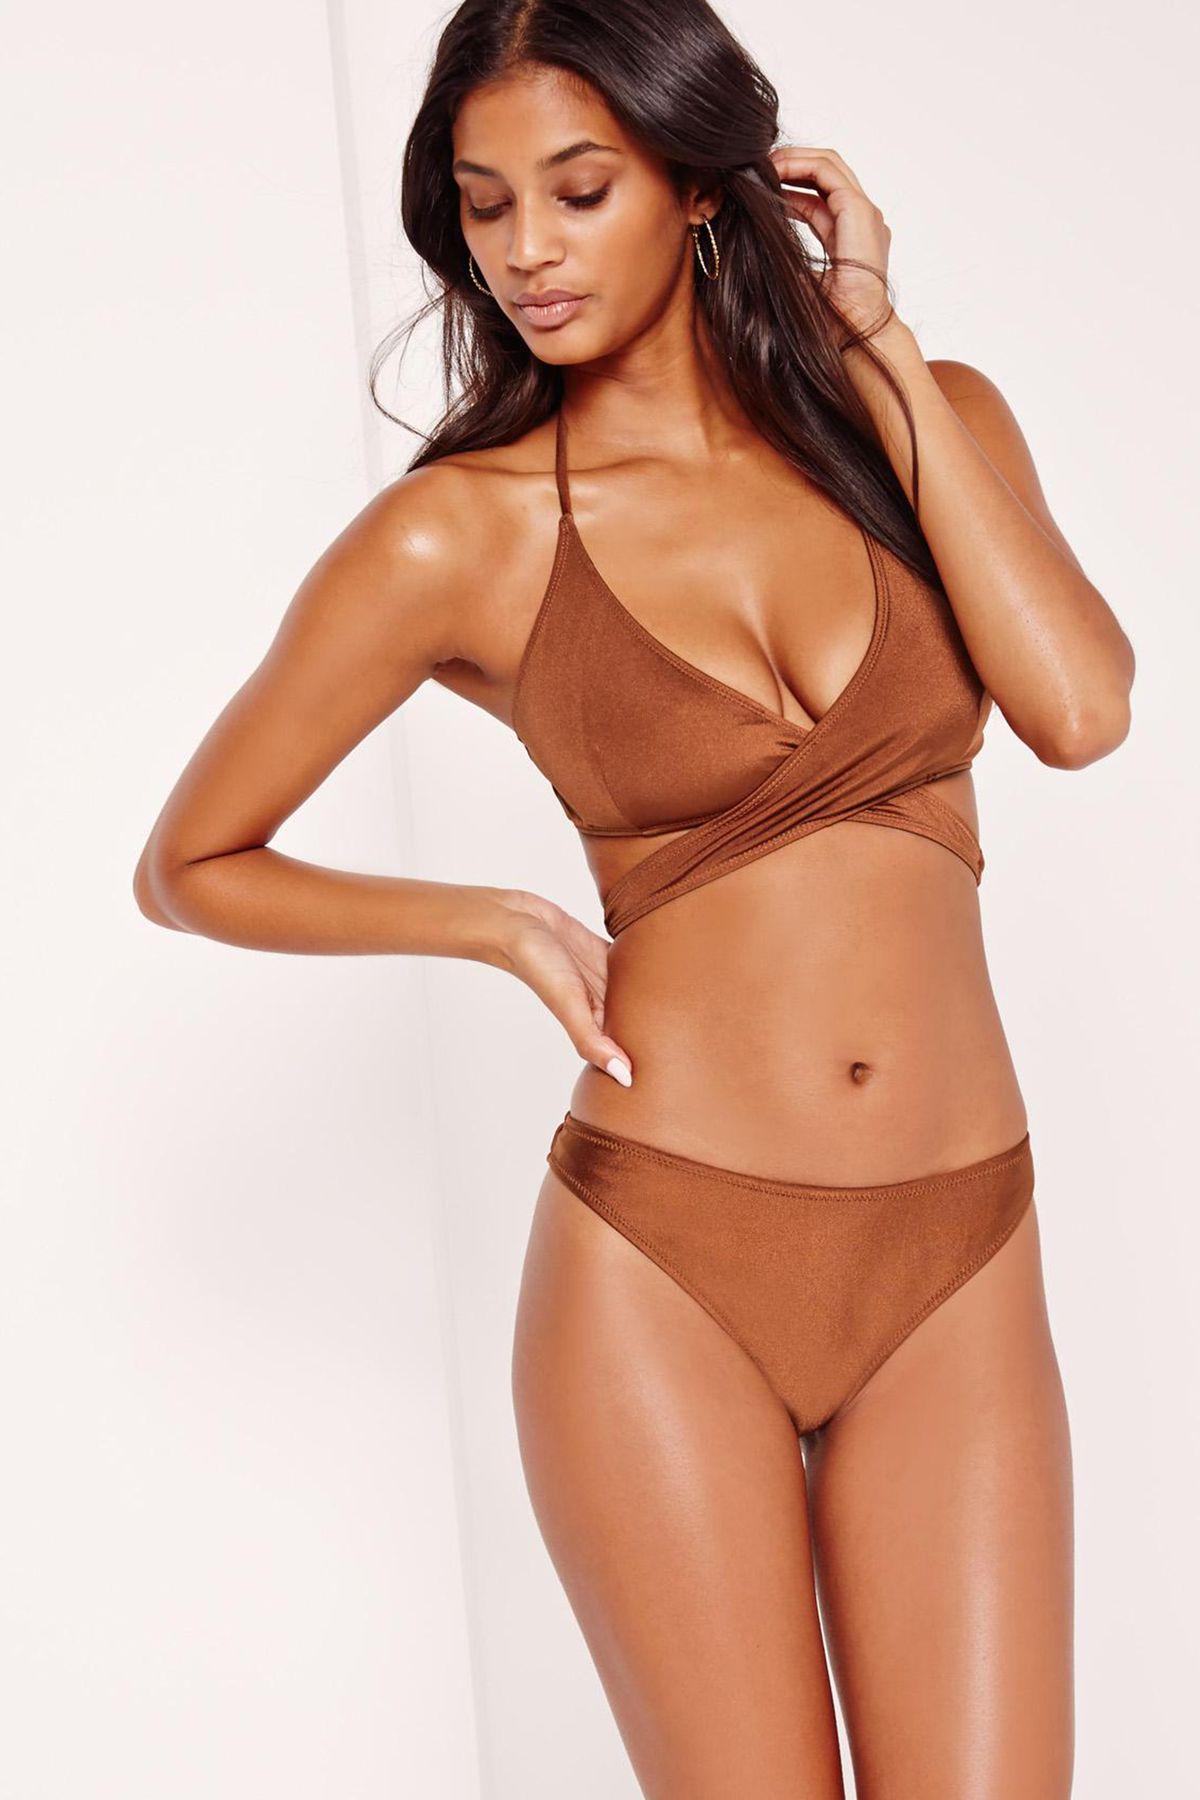 Missguided Bikini Top, $18, and Hipster Bikini Bottoms, $14.40